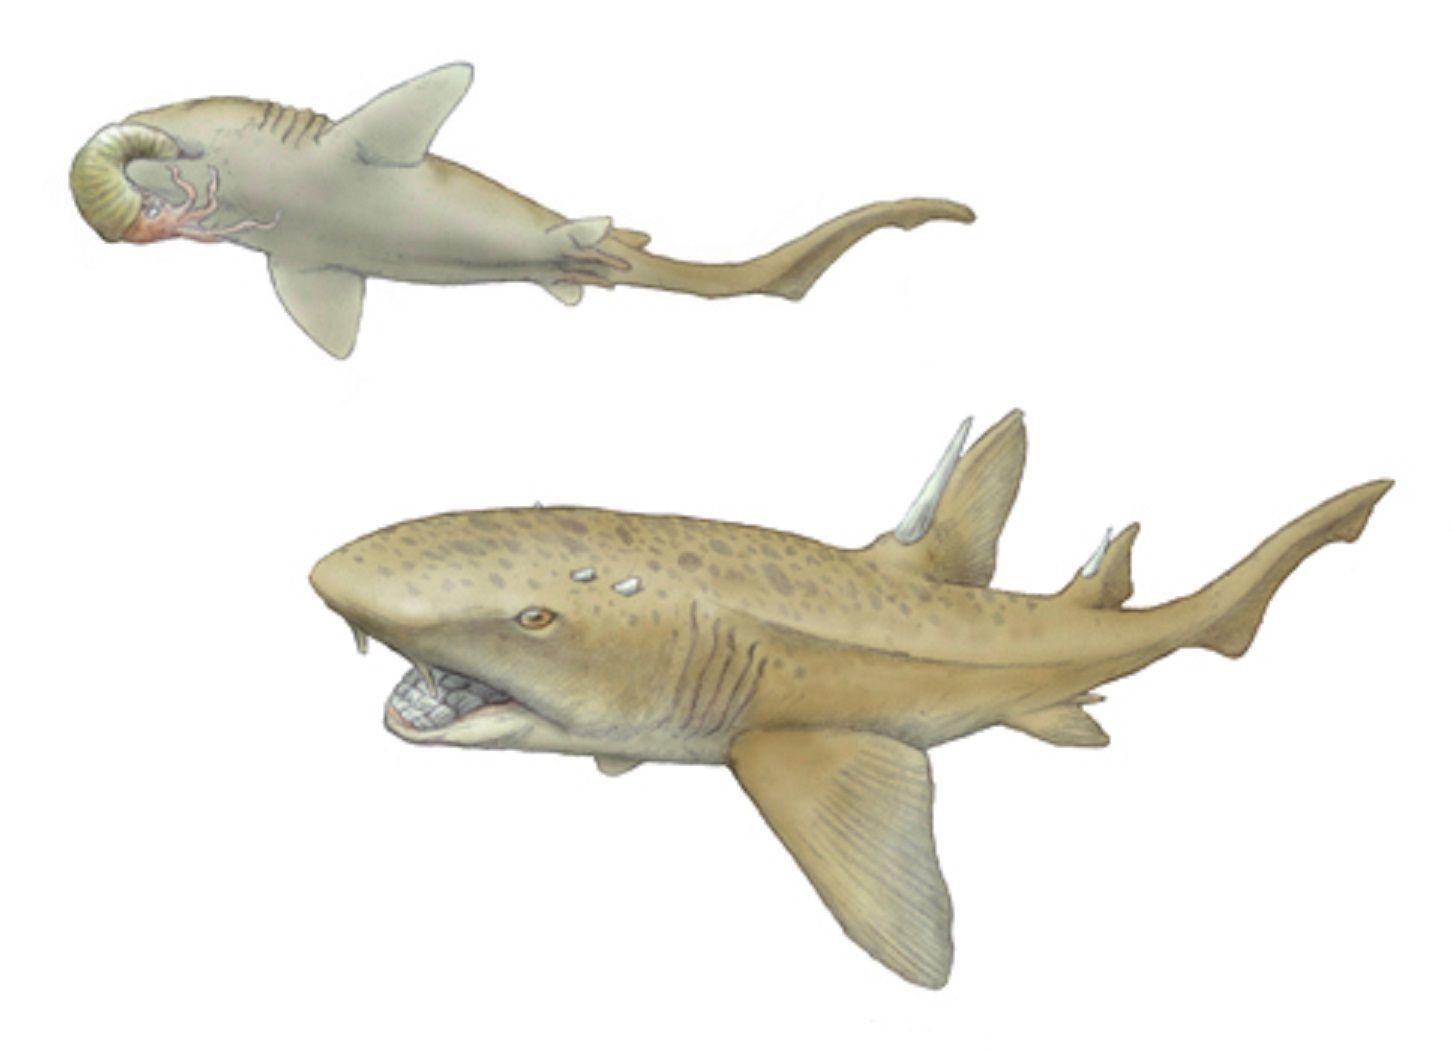 art illustration aquatic animals leptostyrax macrorhiza a art illustration aquatic animals ptychodus is a hybodontiformes extinct genus of shark that